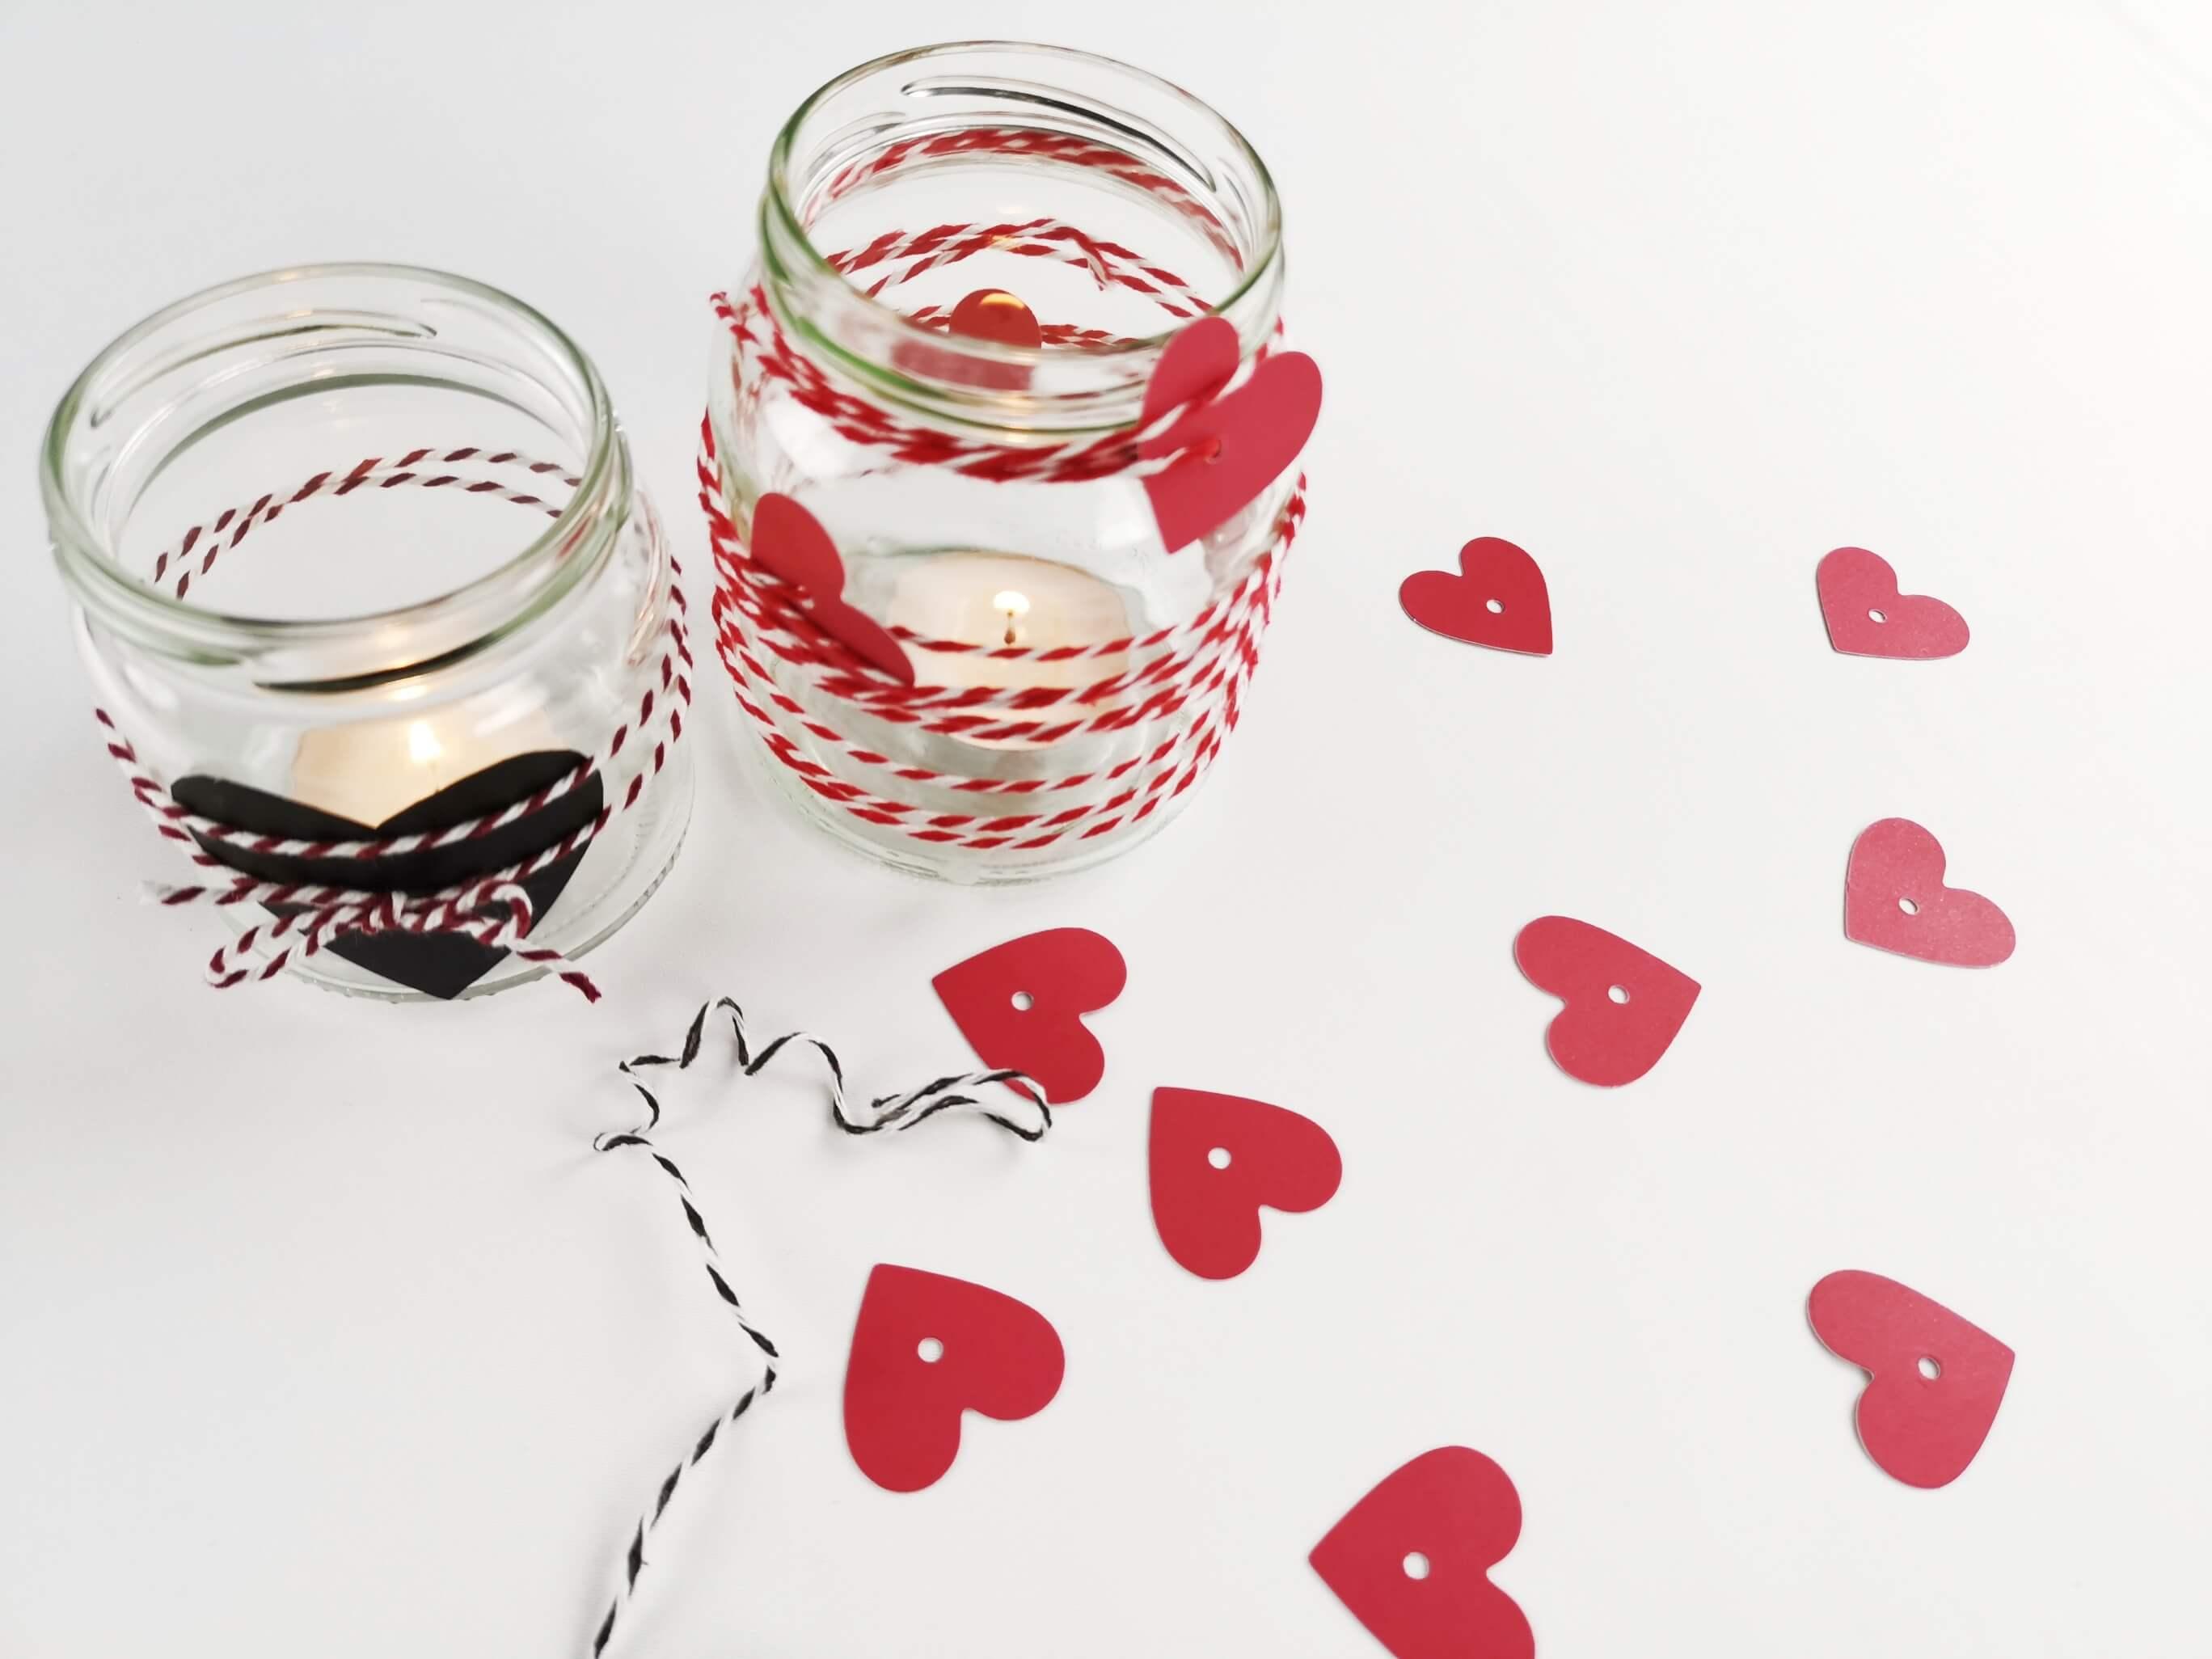 IMG 20190204 165419 01 resized 20190204 073727001 - Nur keine Panik! Last minute Valentinstagsgeschenke